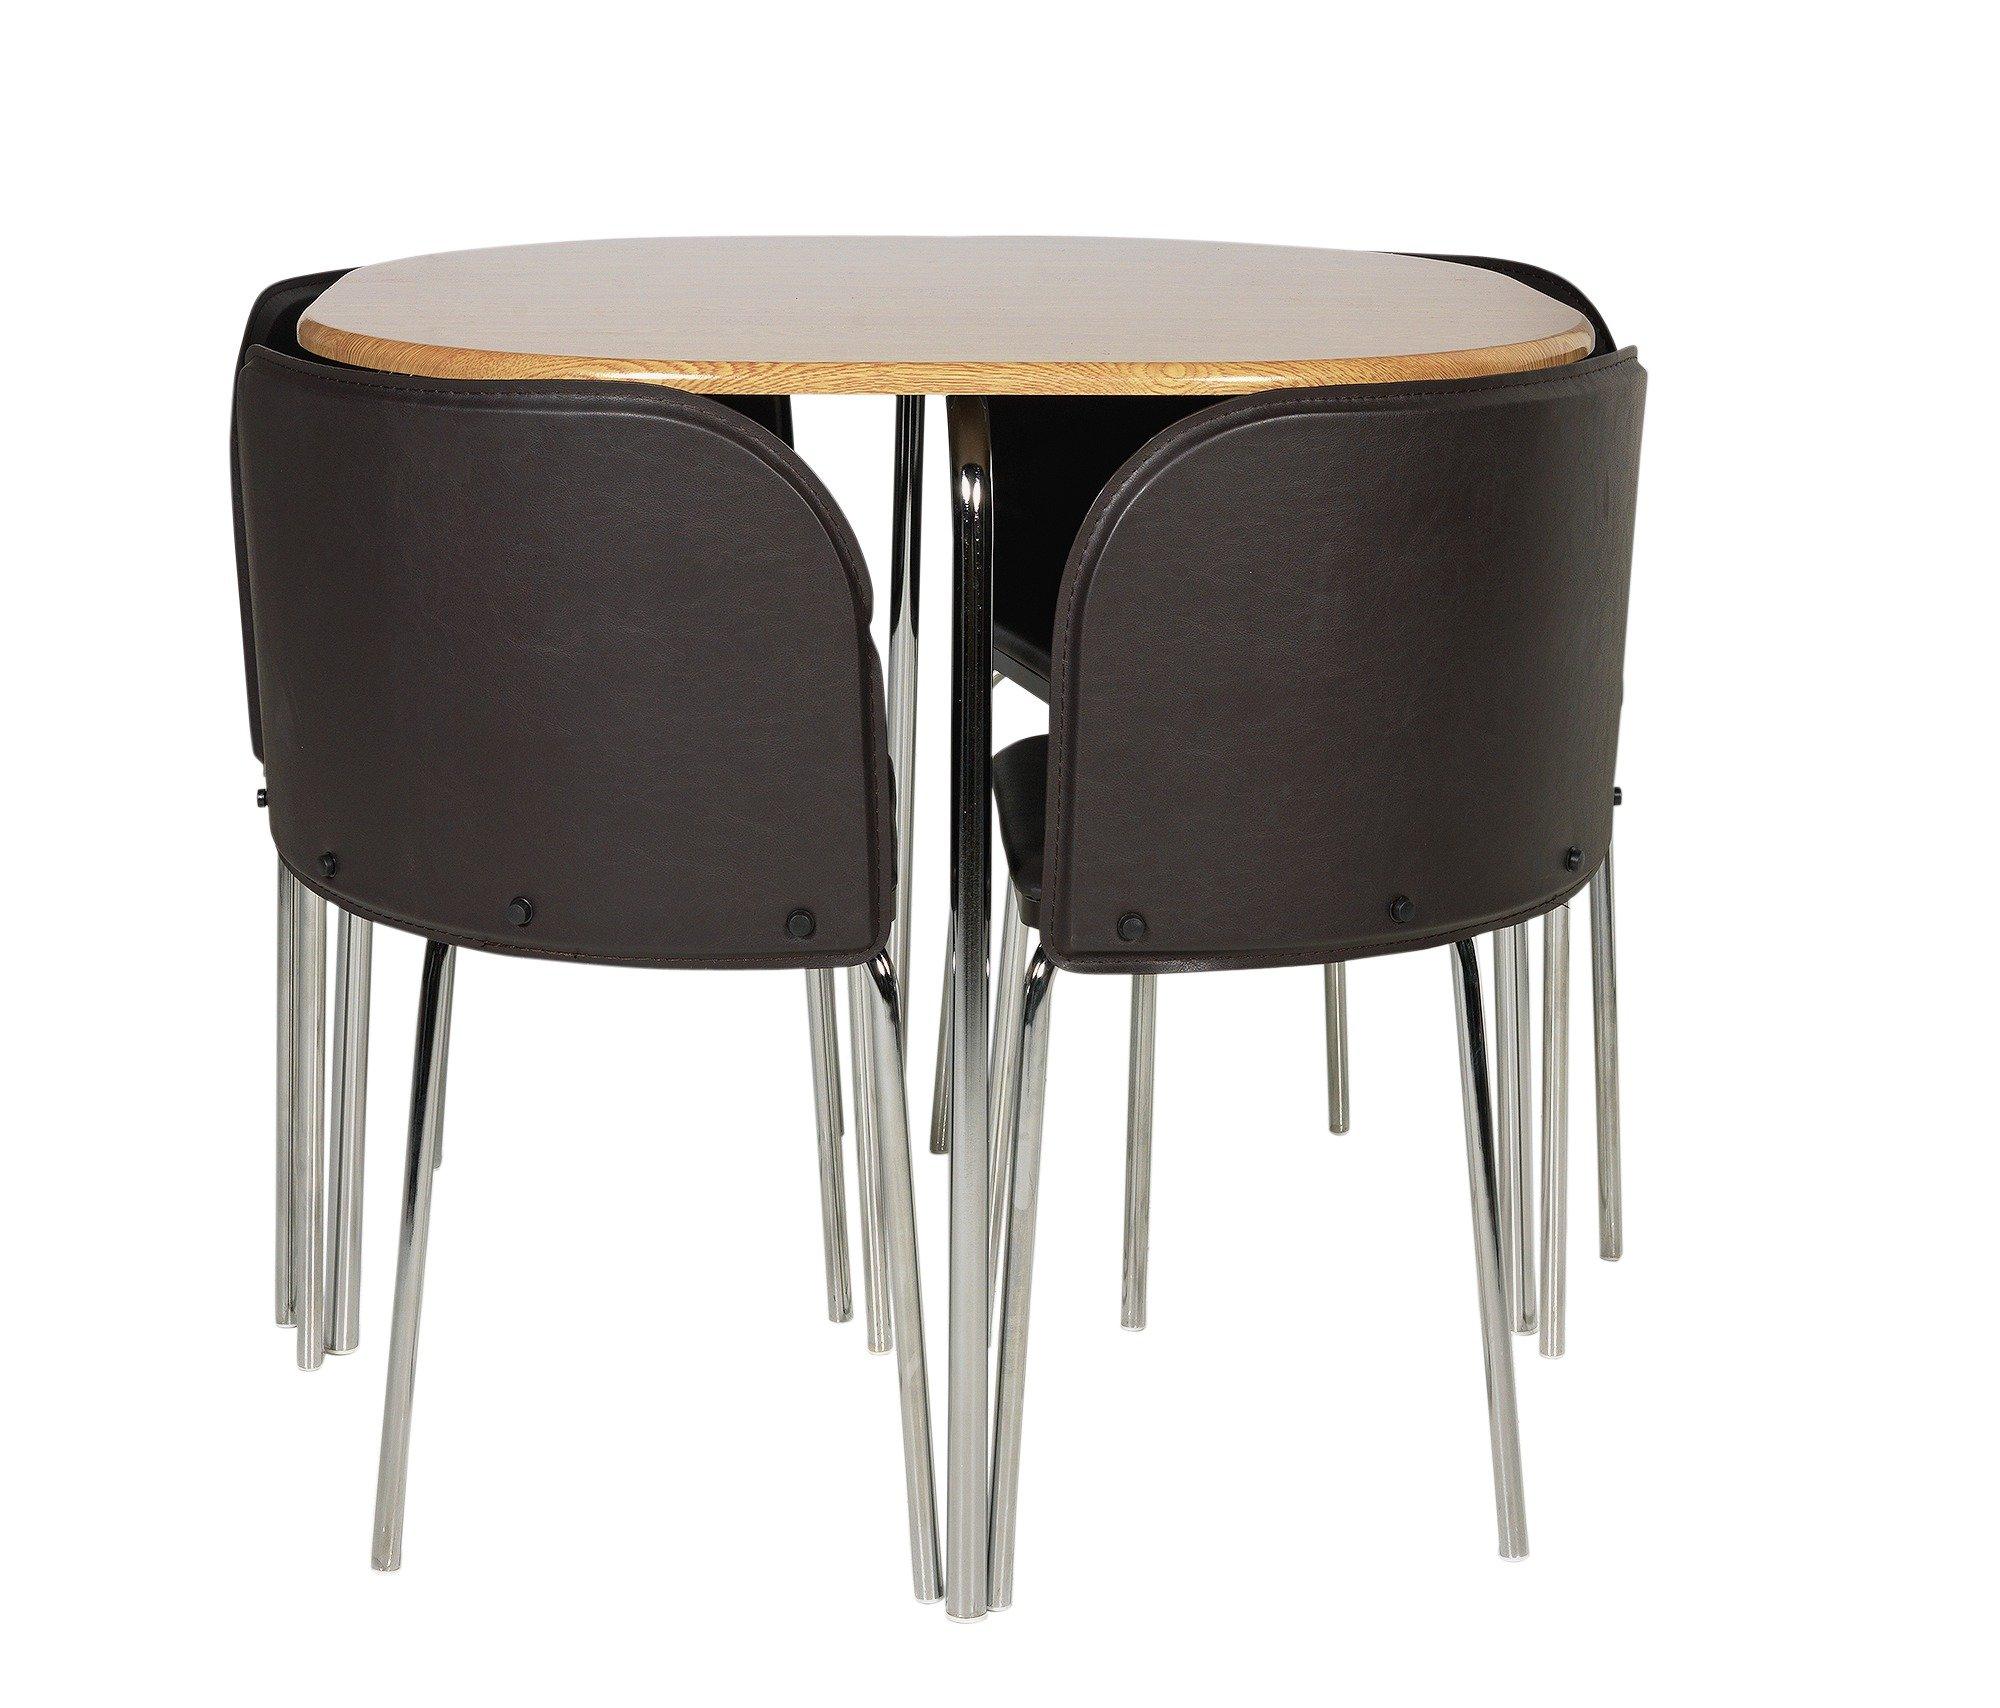 Buy Hygena Amparo Oak Effect Dining Table amp 4 Chairs  : 6006352RZ013AWebampw570amph513 from www.argos.co.uk size 570 x 513 jpeg 21kB